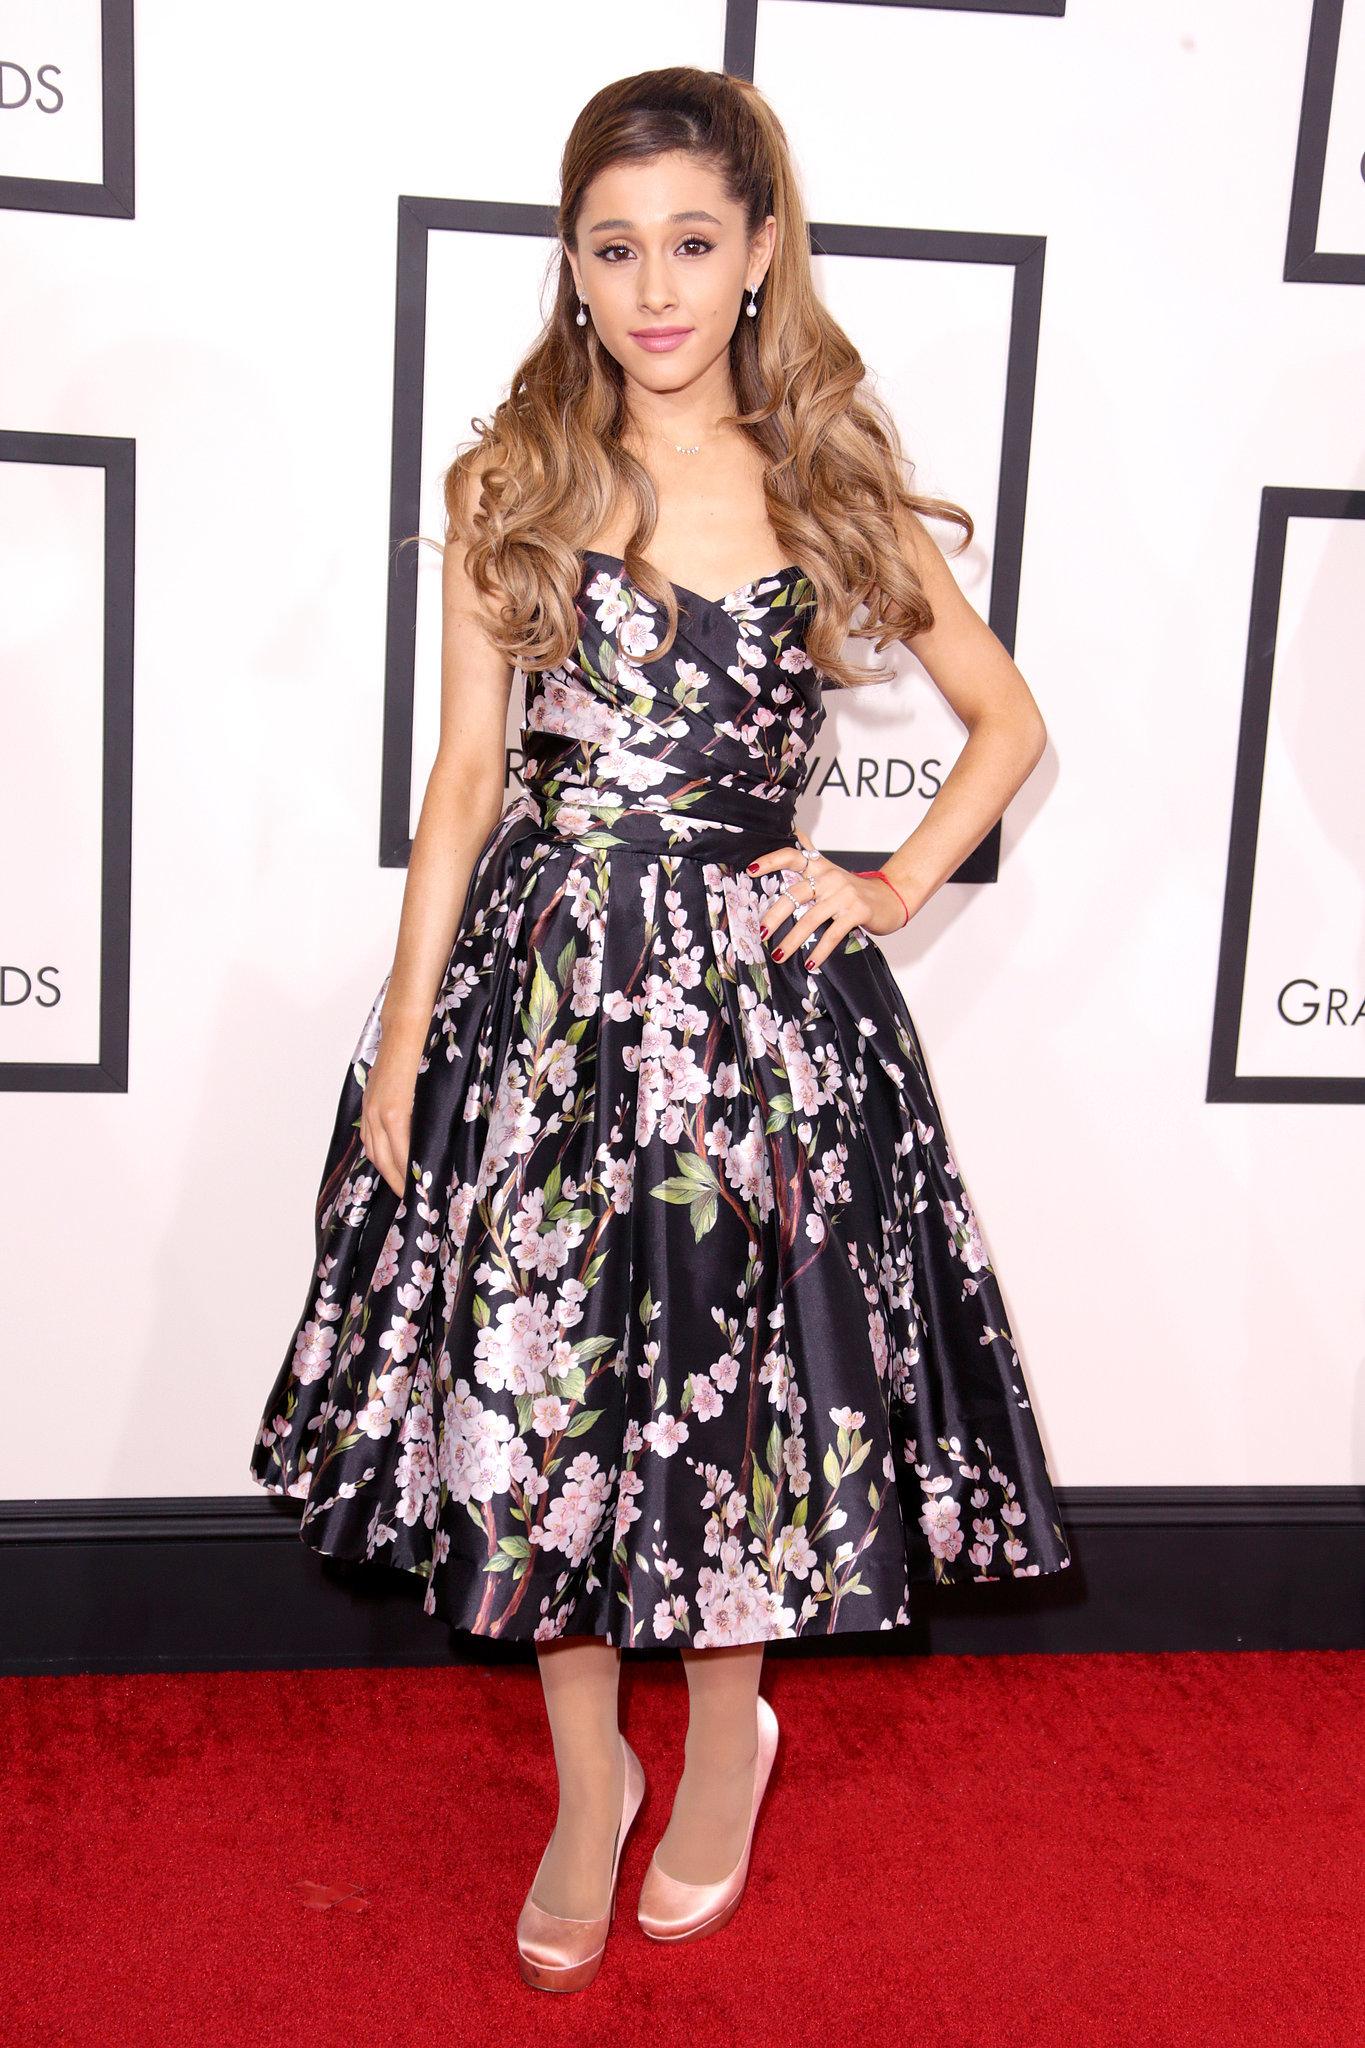 Ariana Grande at the Grammys 2014